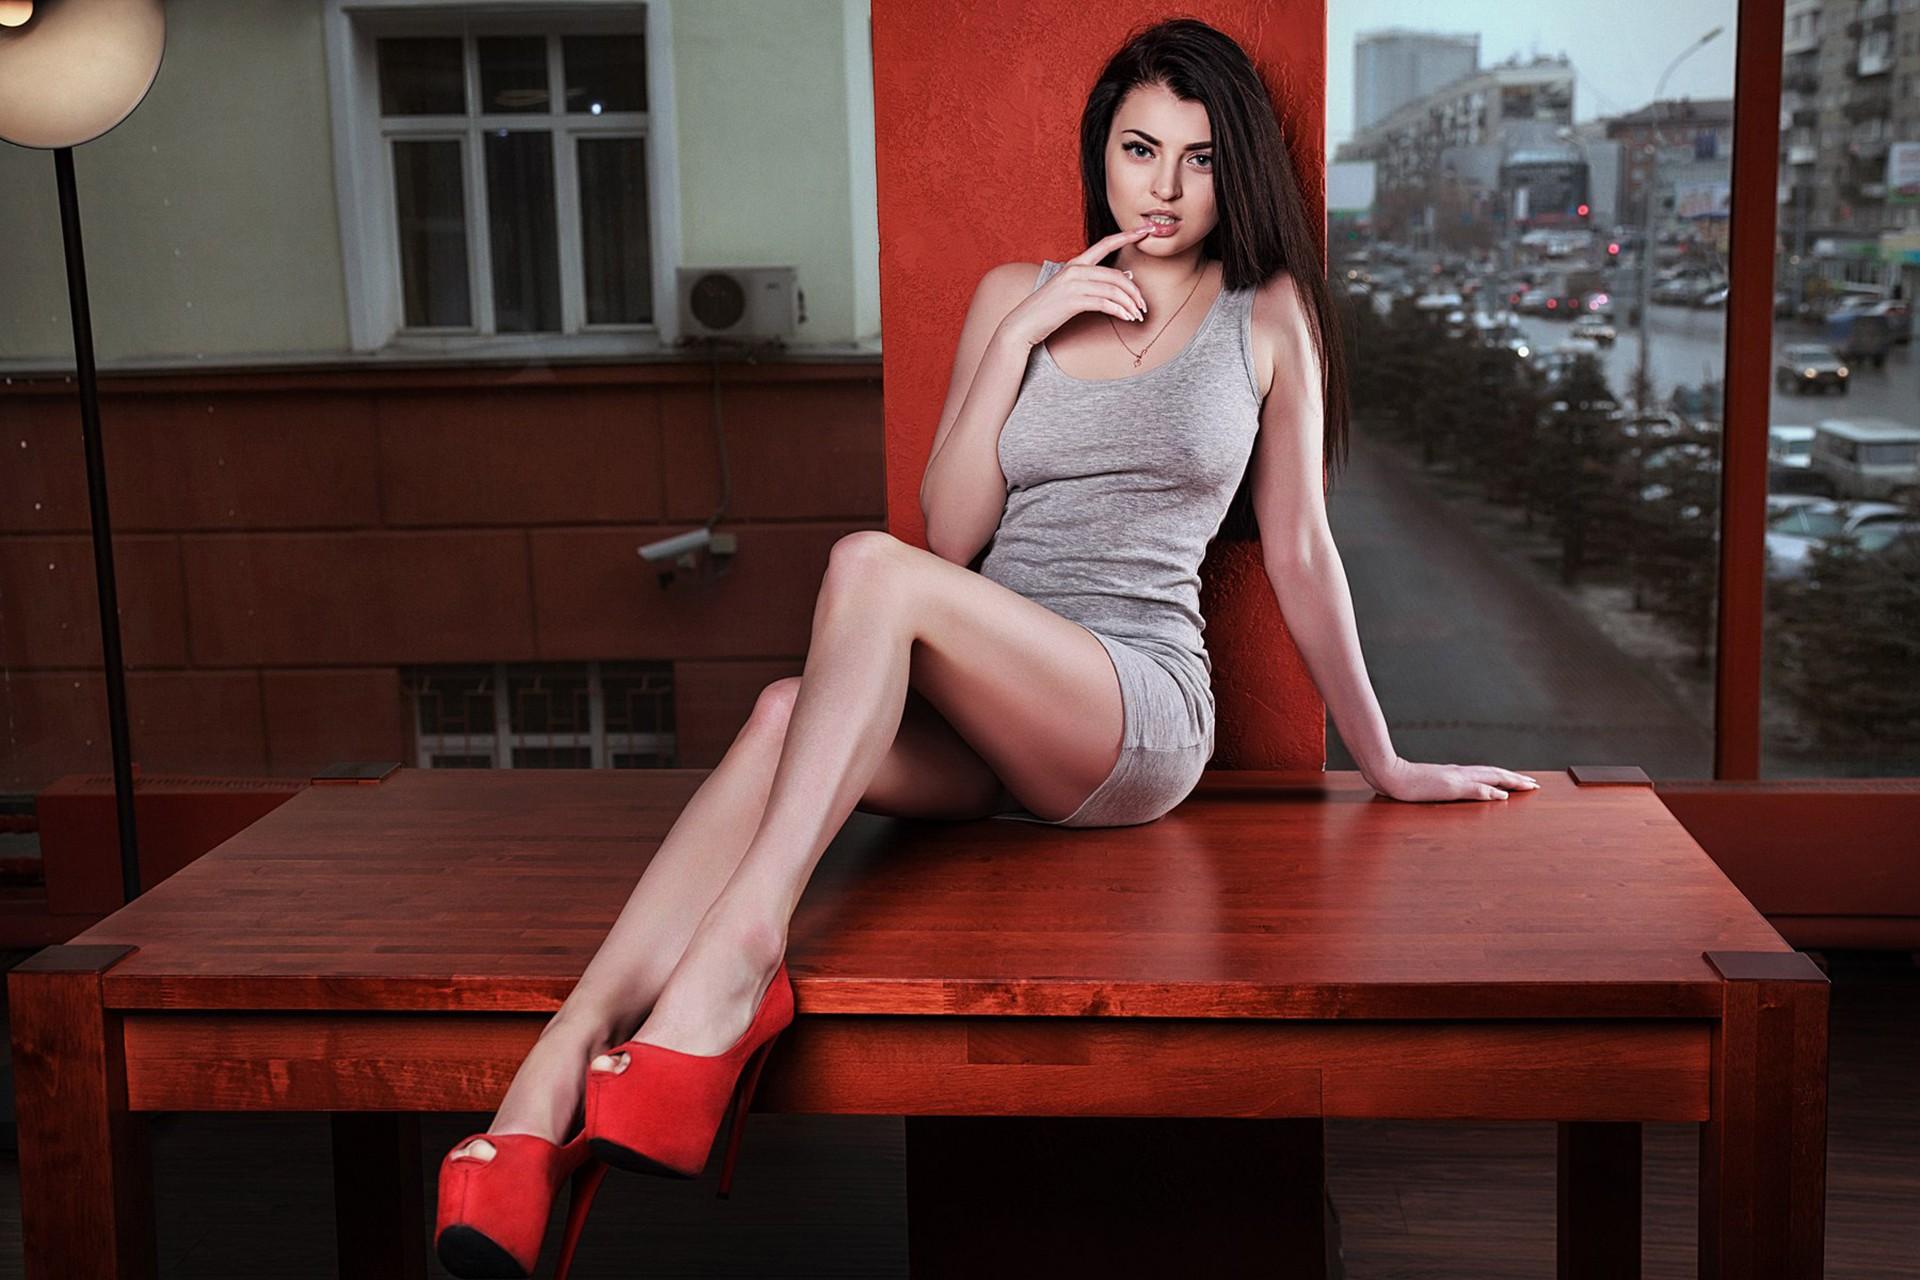 Hintergrundbilder : Frau, Modell-, Porträt, lange Haare, Brünette ...